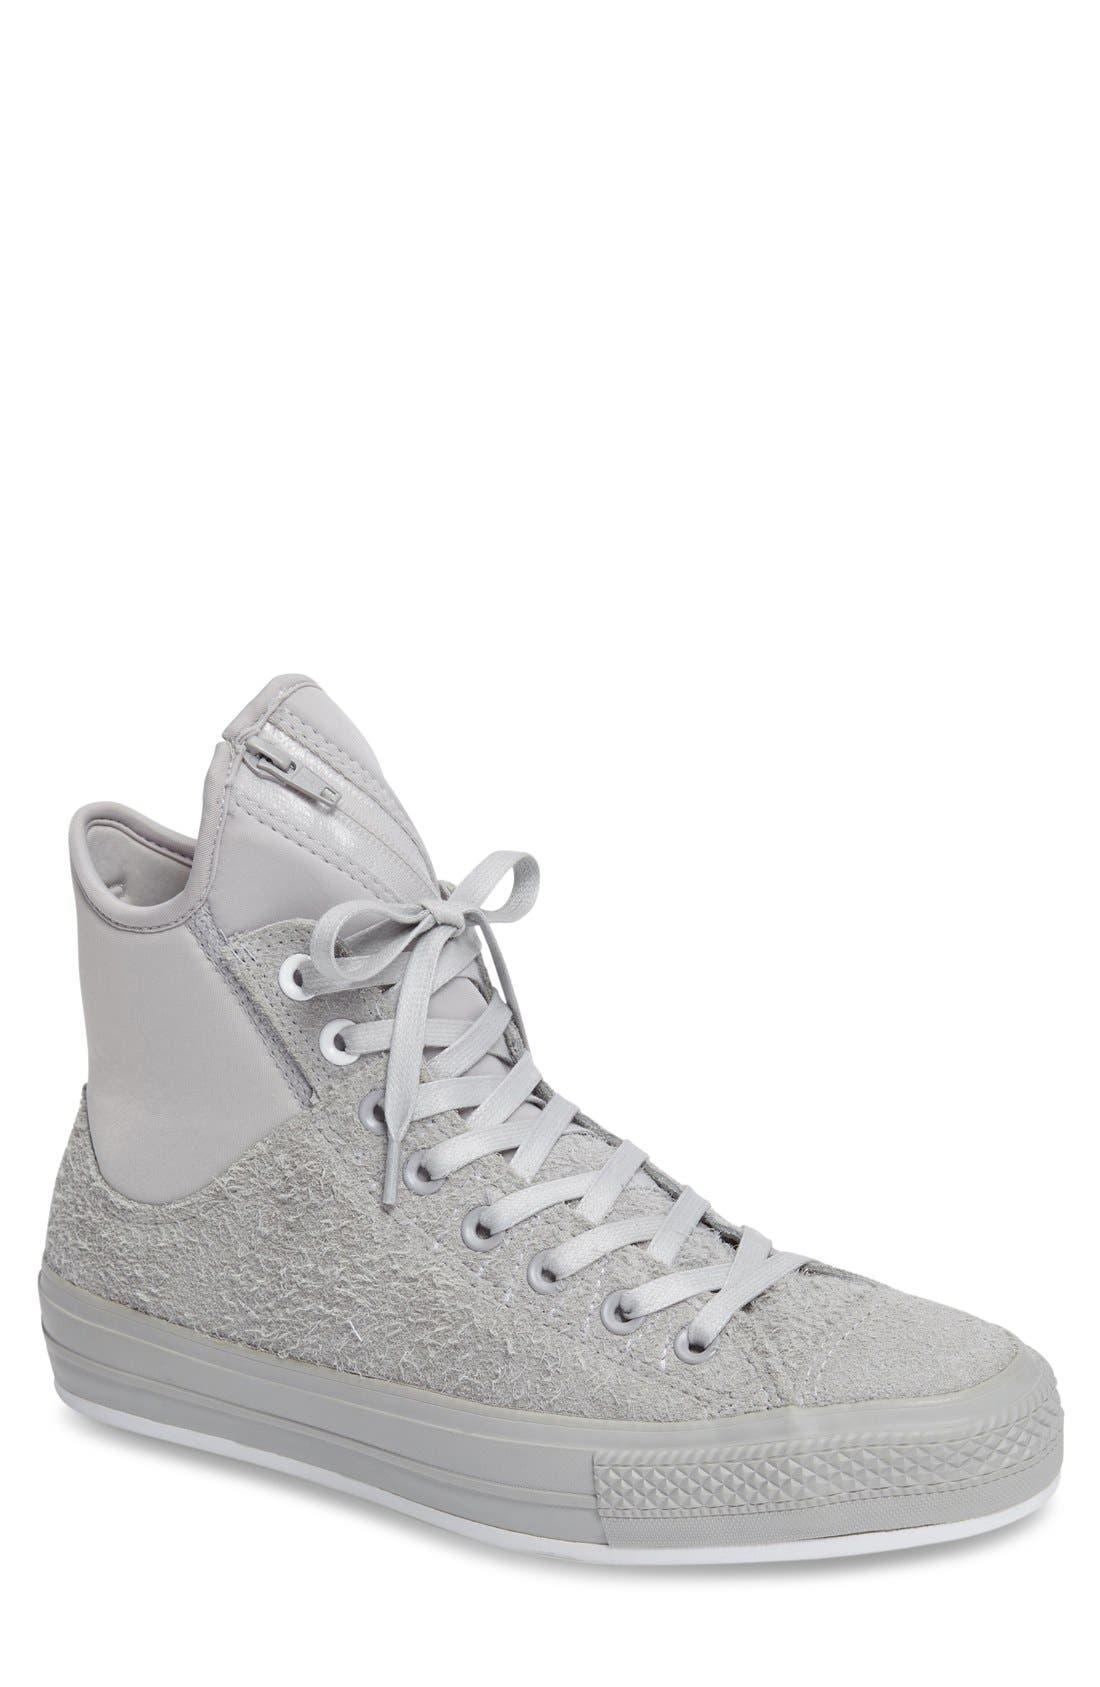 Main Image - Converse Chuck Taylor® All Star® MA-1 SE High Top Sneaker (Men)